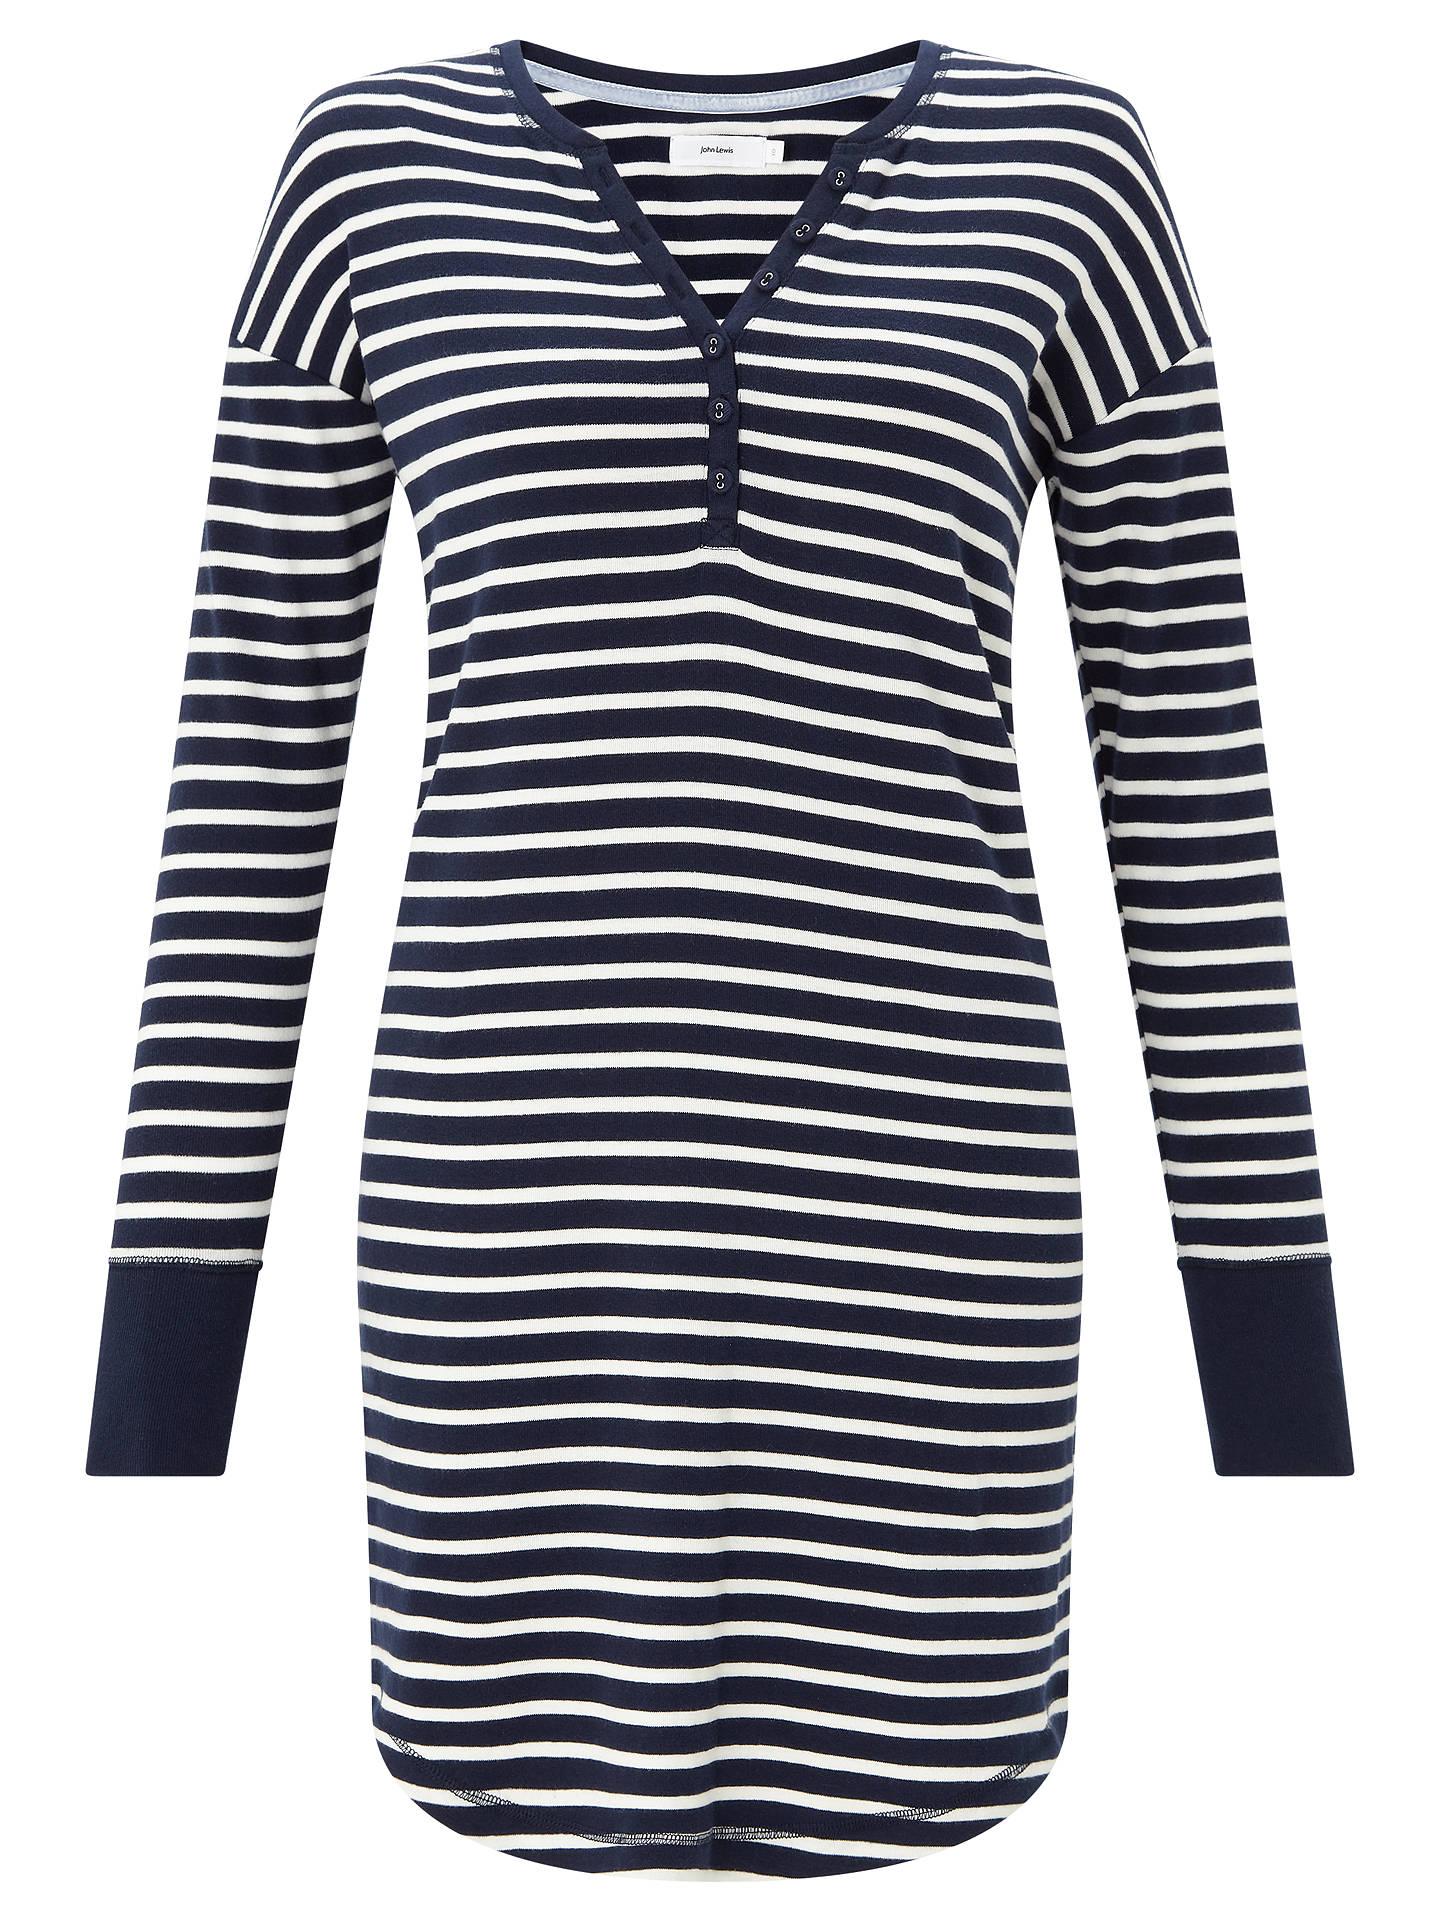 ... BuyJohn Lewis   Partners Edie Striped Long Sleeve Nightdress c20aa5ad9